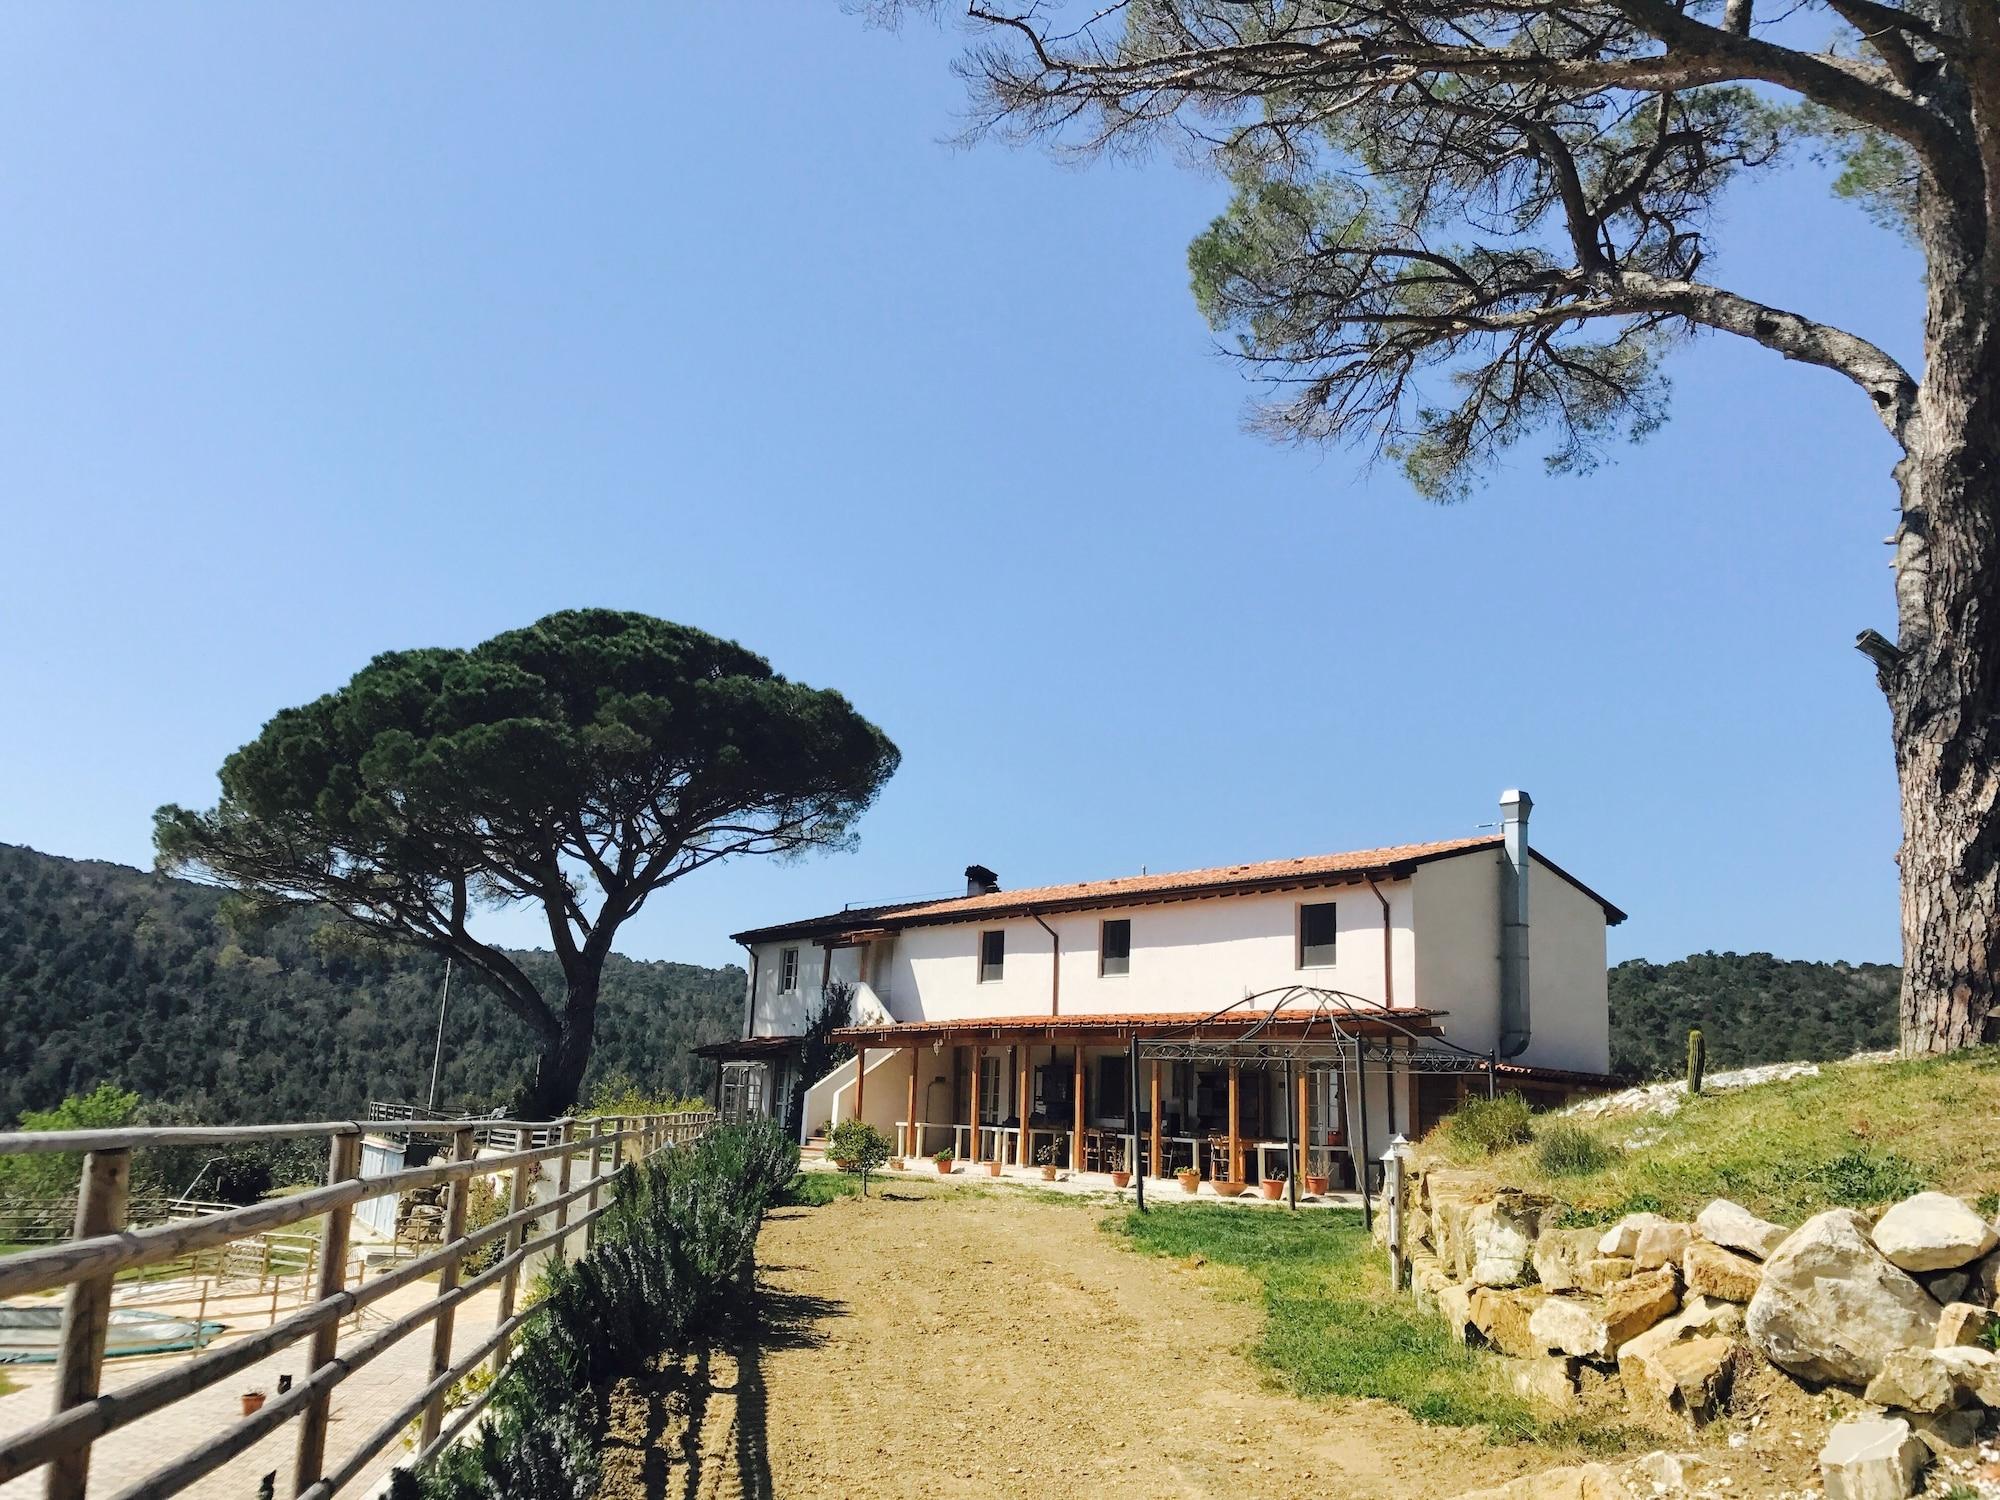 Agriturismo La Mignola, Livorno